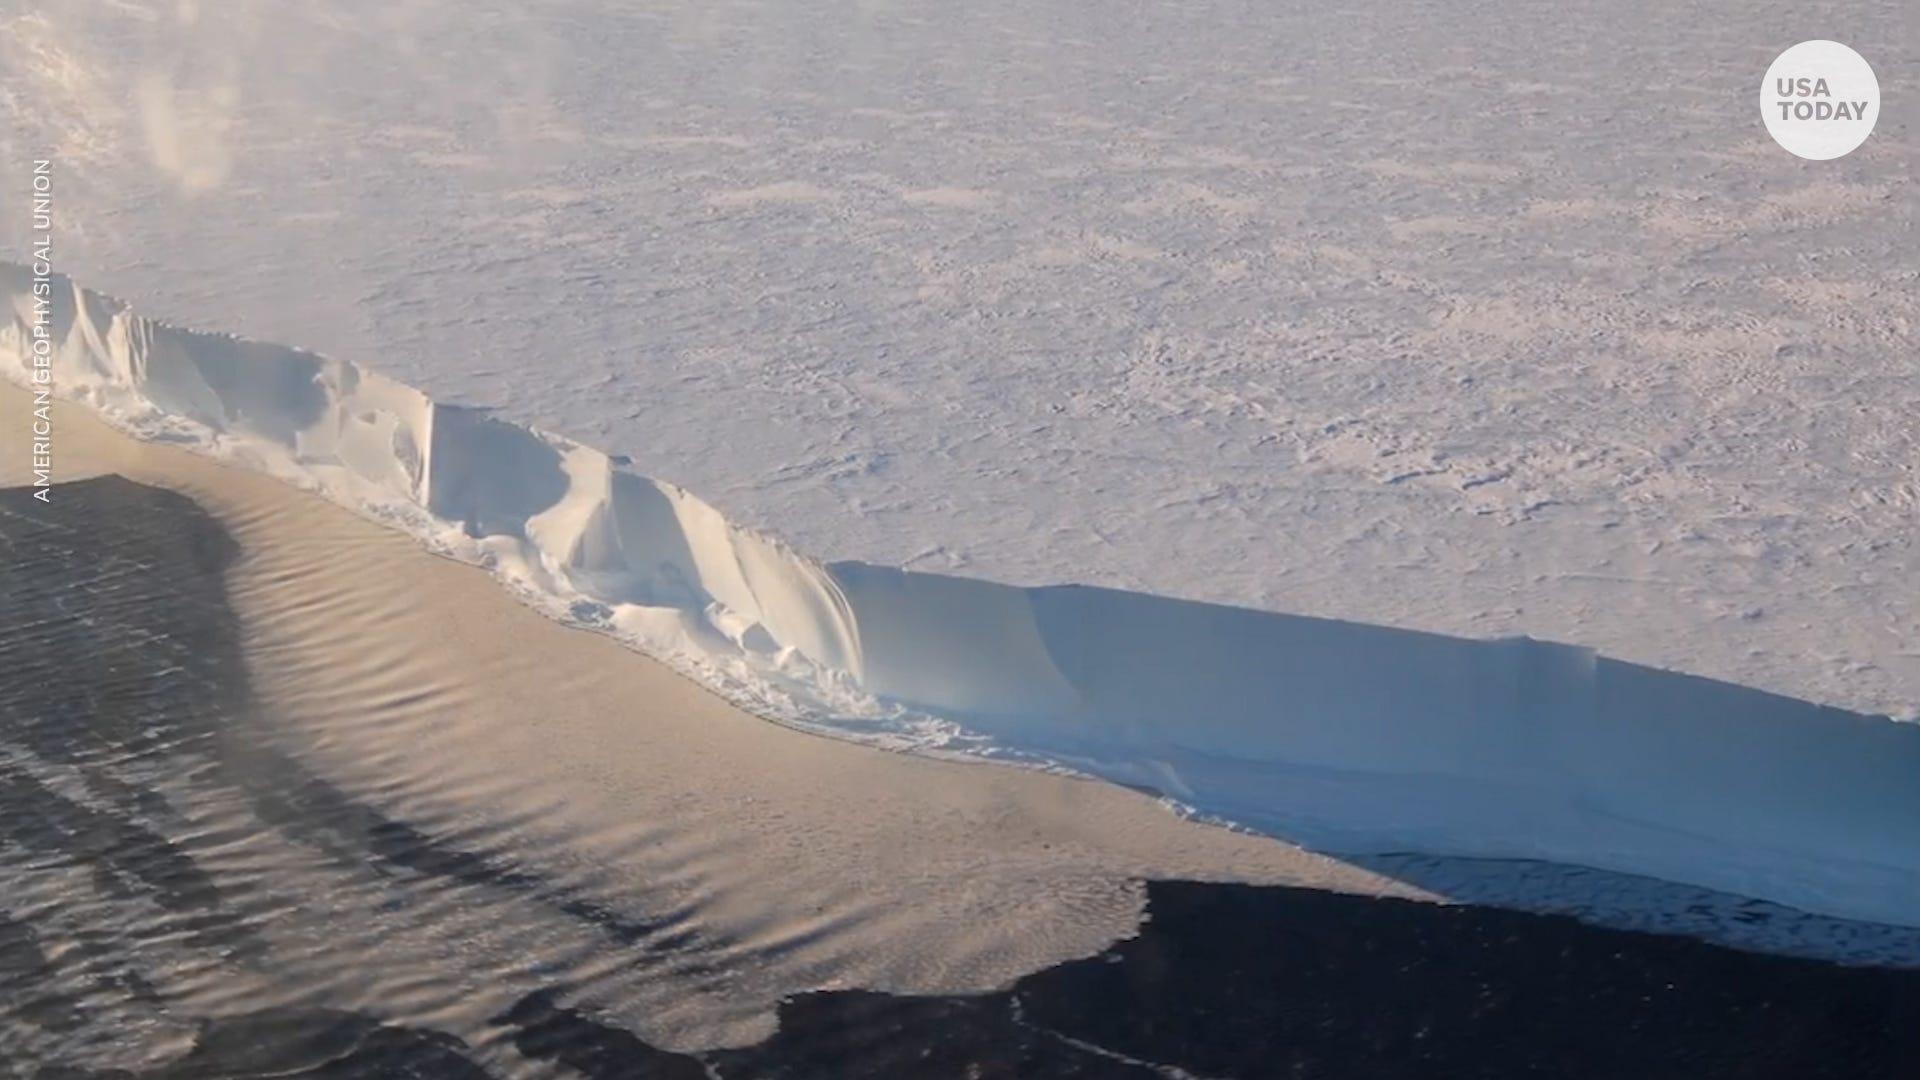 Eerie noises recorded from Antarctica's ice shelf